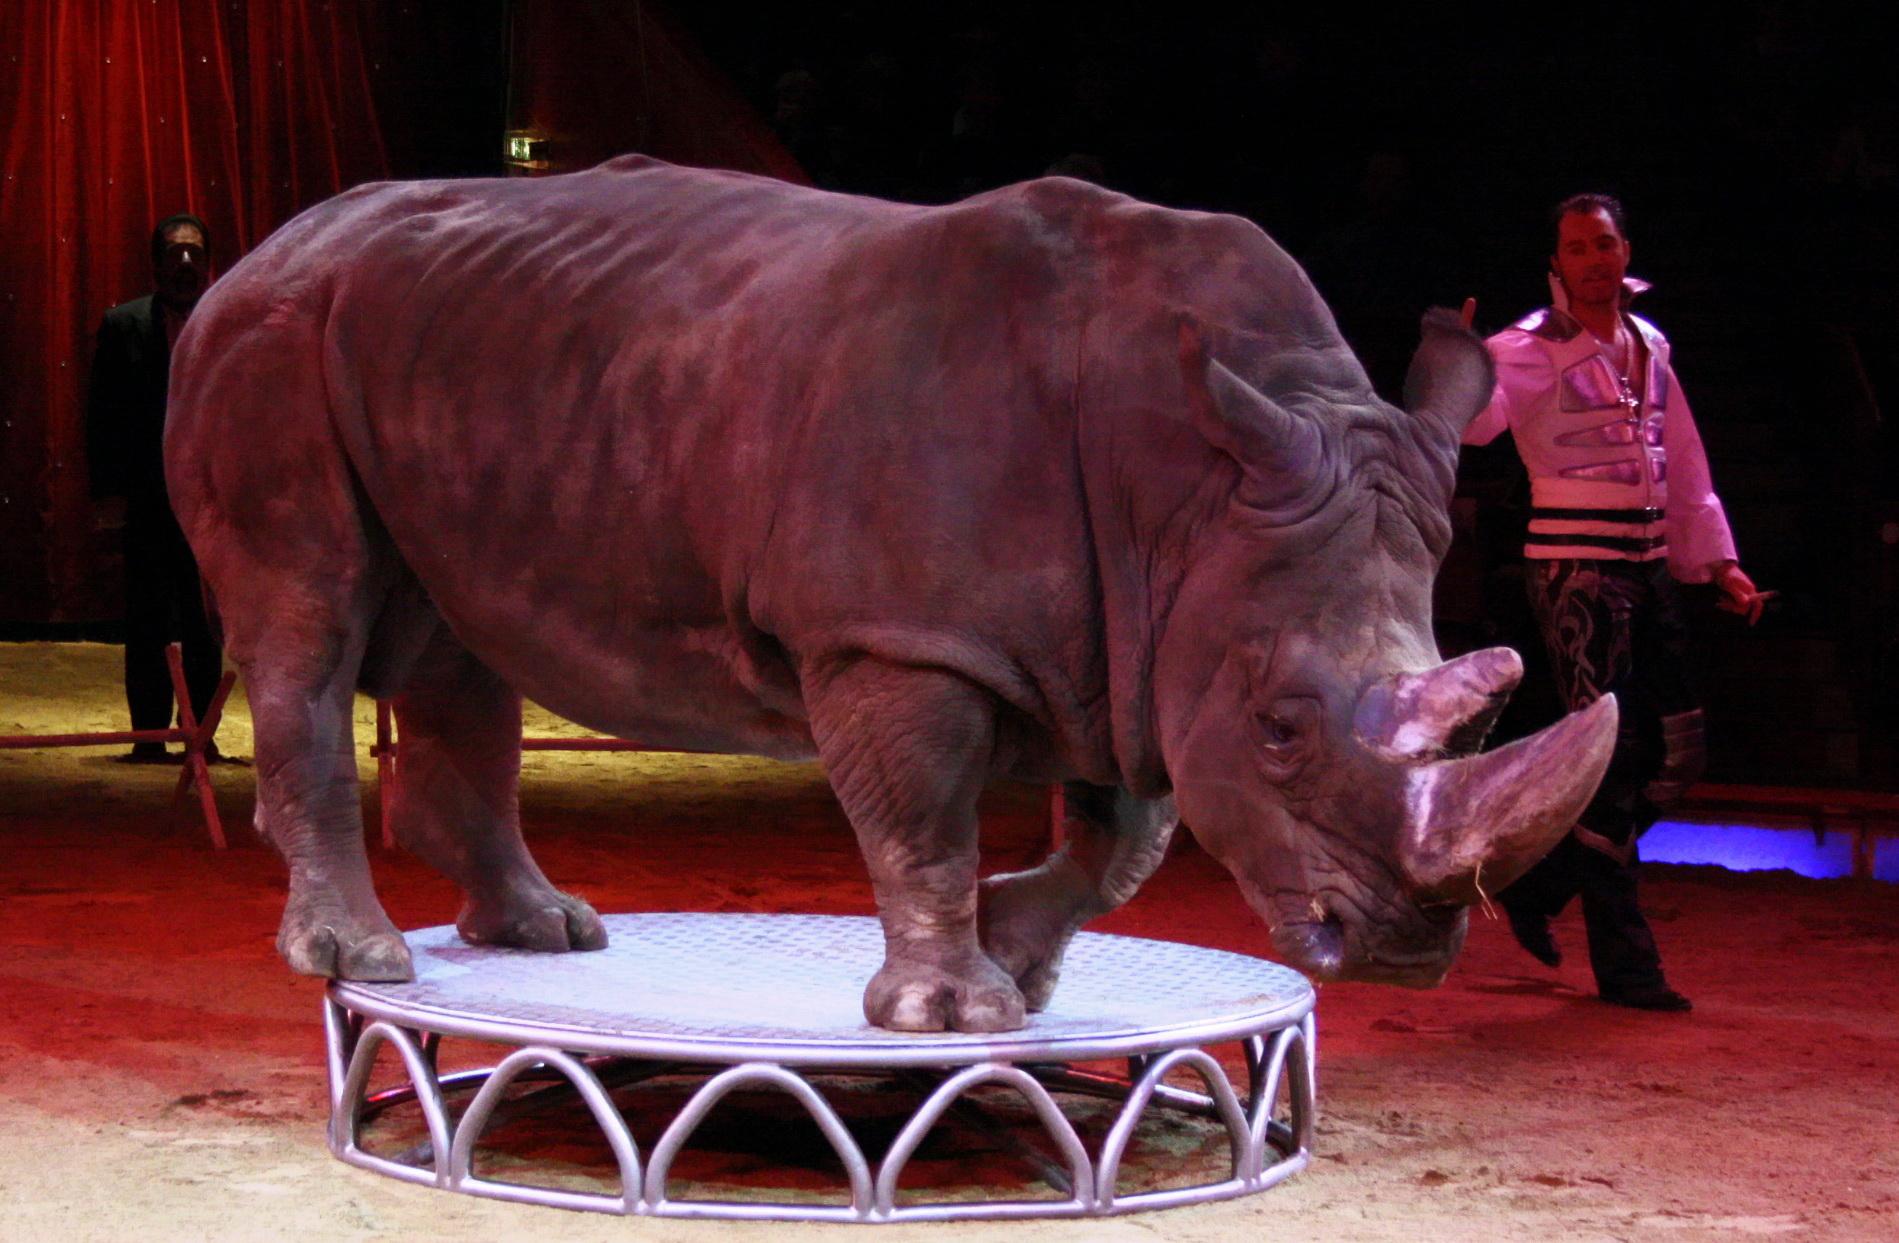 FileNashorn Circus Krone MARTIN LACEY JrJPG Wikimedia